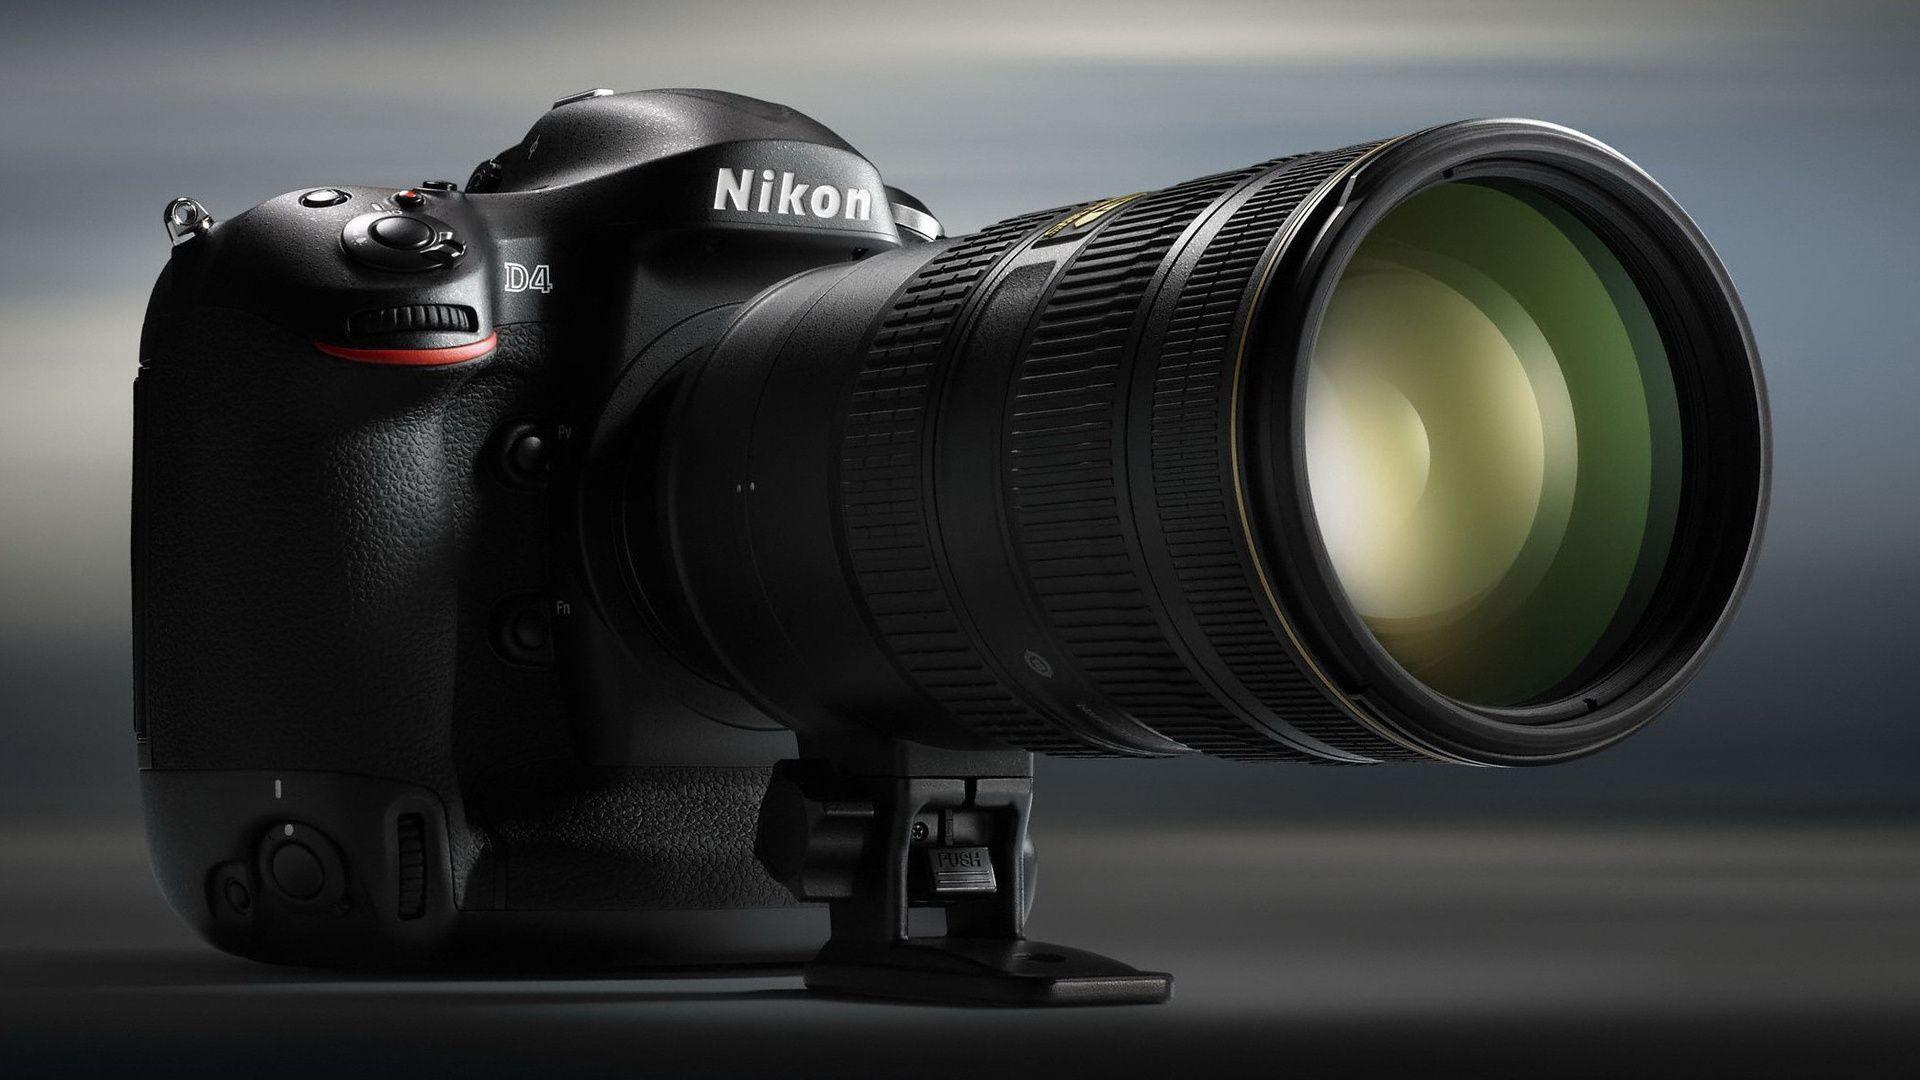 Pin Von Mollana Auf Fotografi Gear Nikon Camera Und Photography